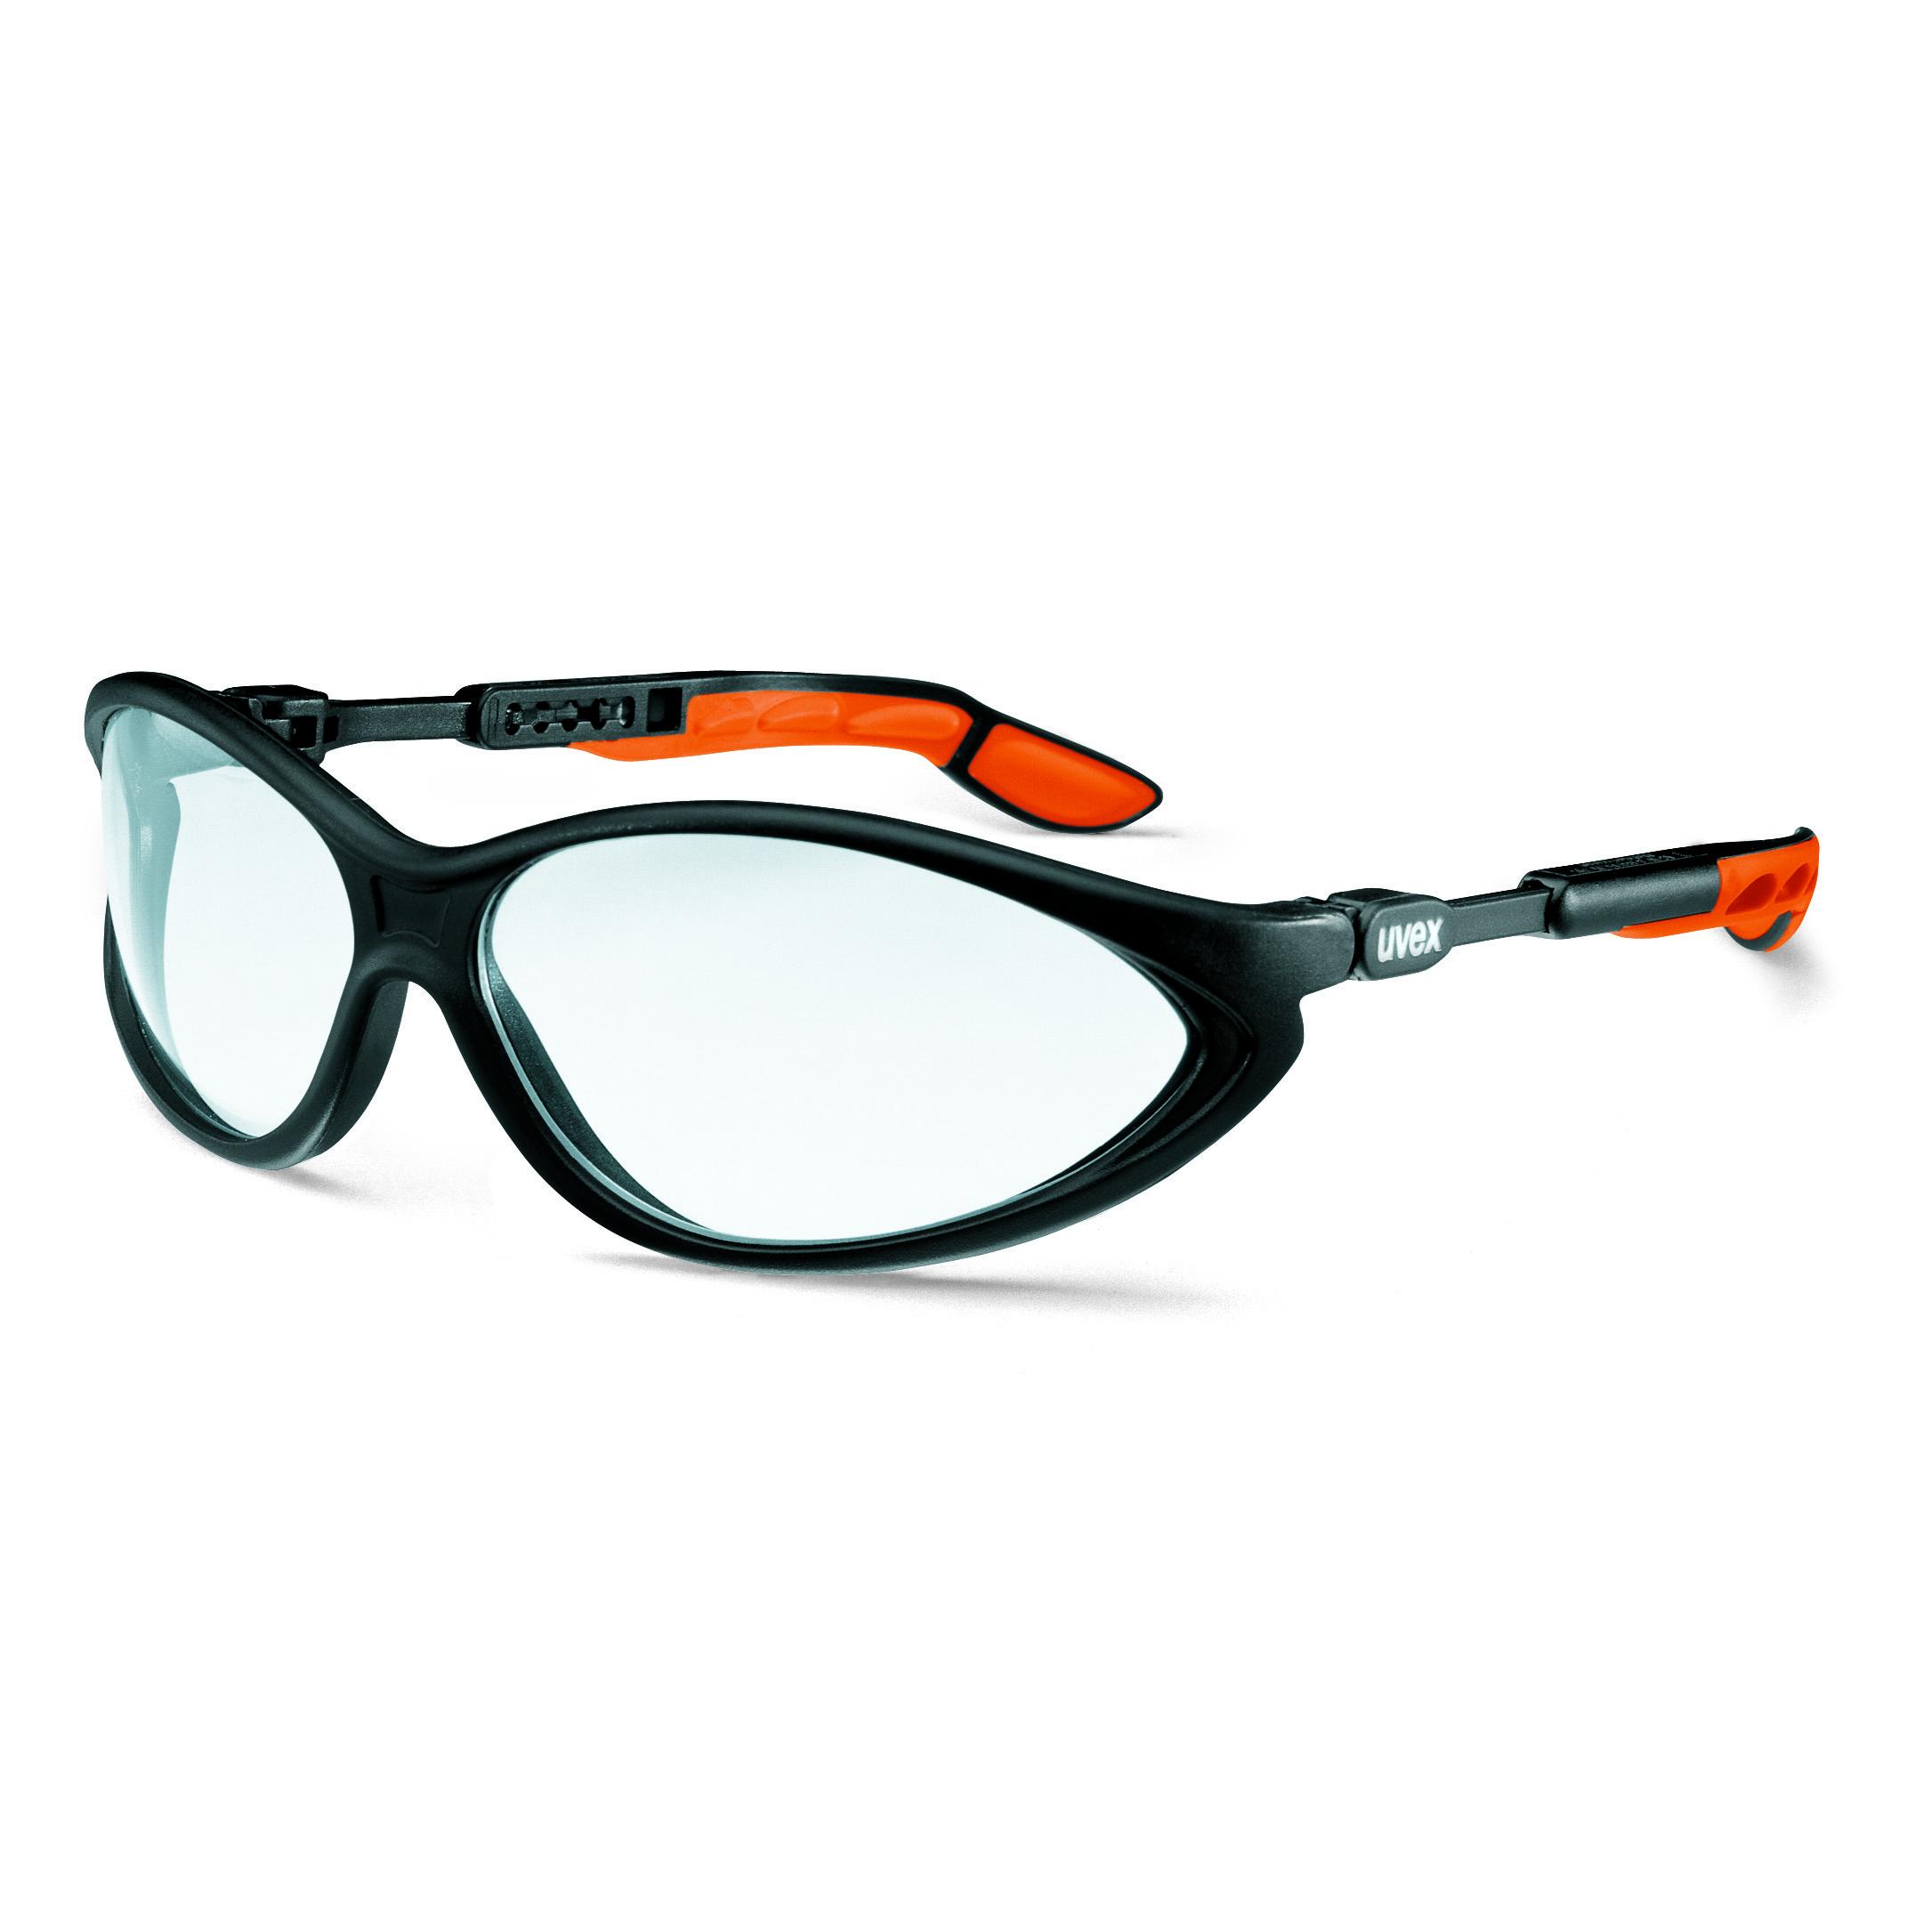 uvex 9188 - cybric / cyberguard - Schutzbrille